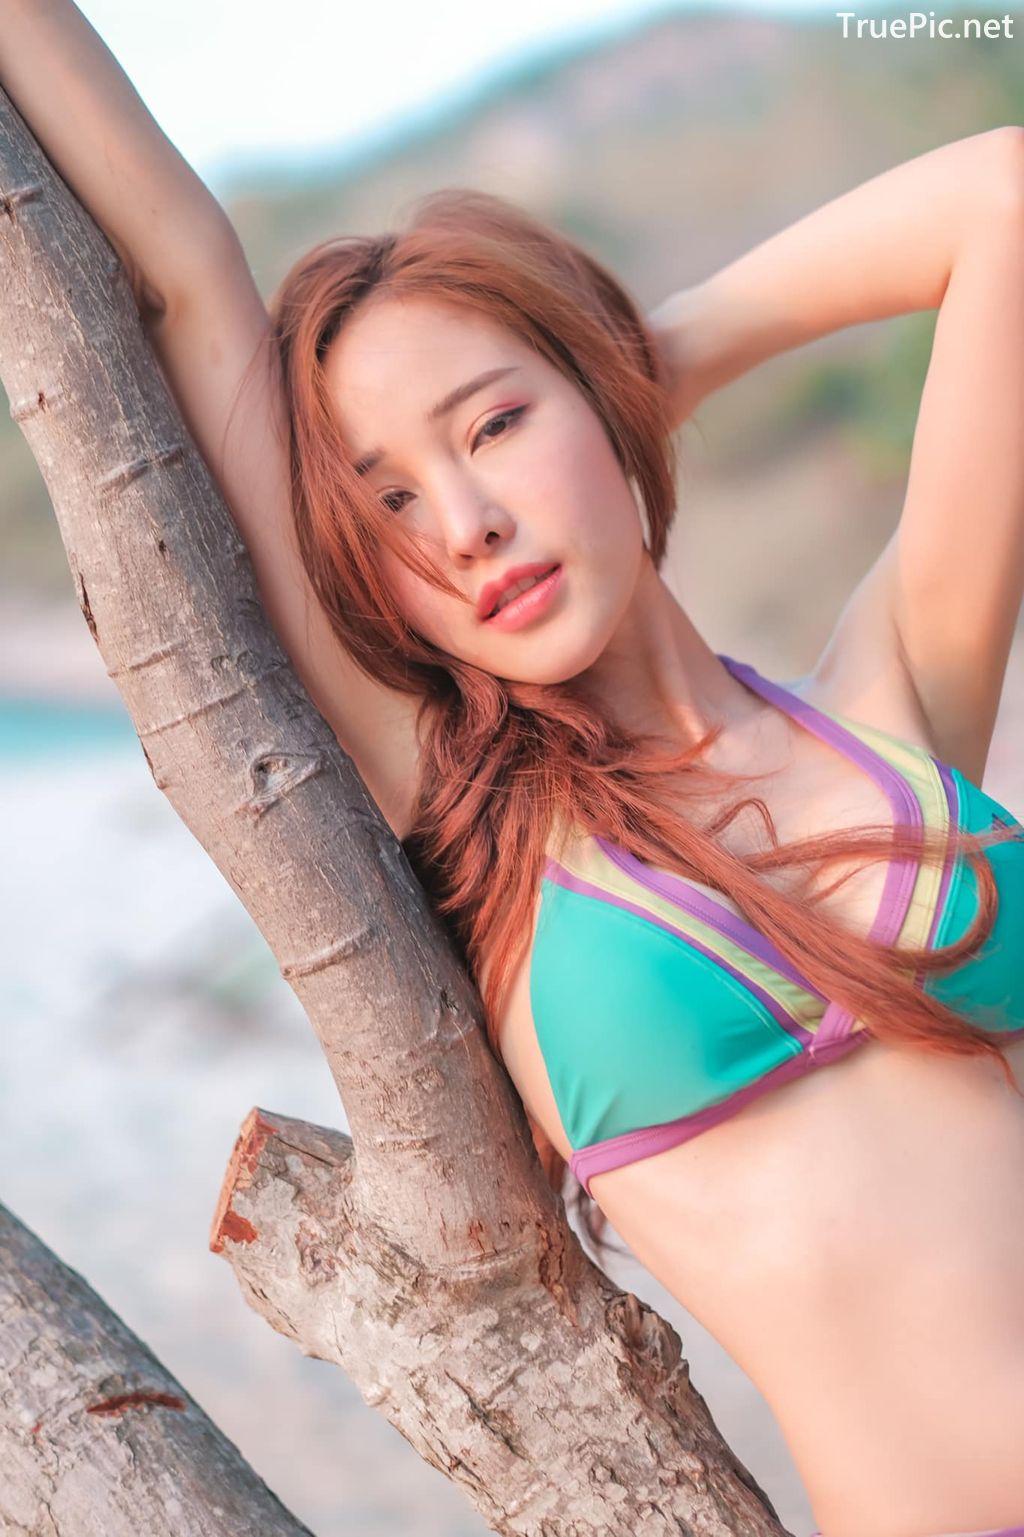 Image-Thailand-Model-Arys-Nam-in-Arysiacara-Summer-Time-Sweet-Bikini-TruePic.net- Picture-2